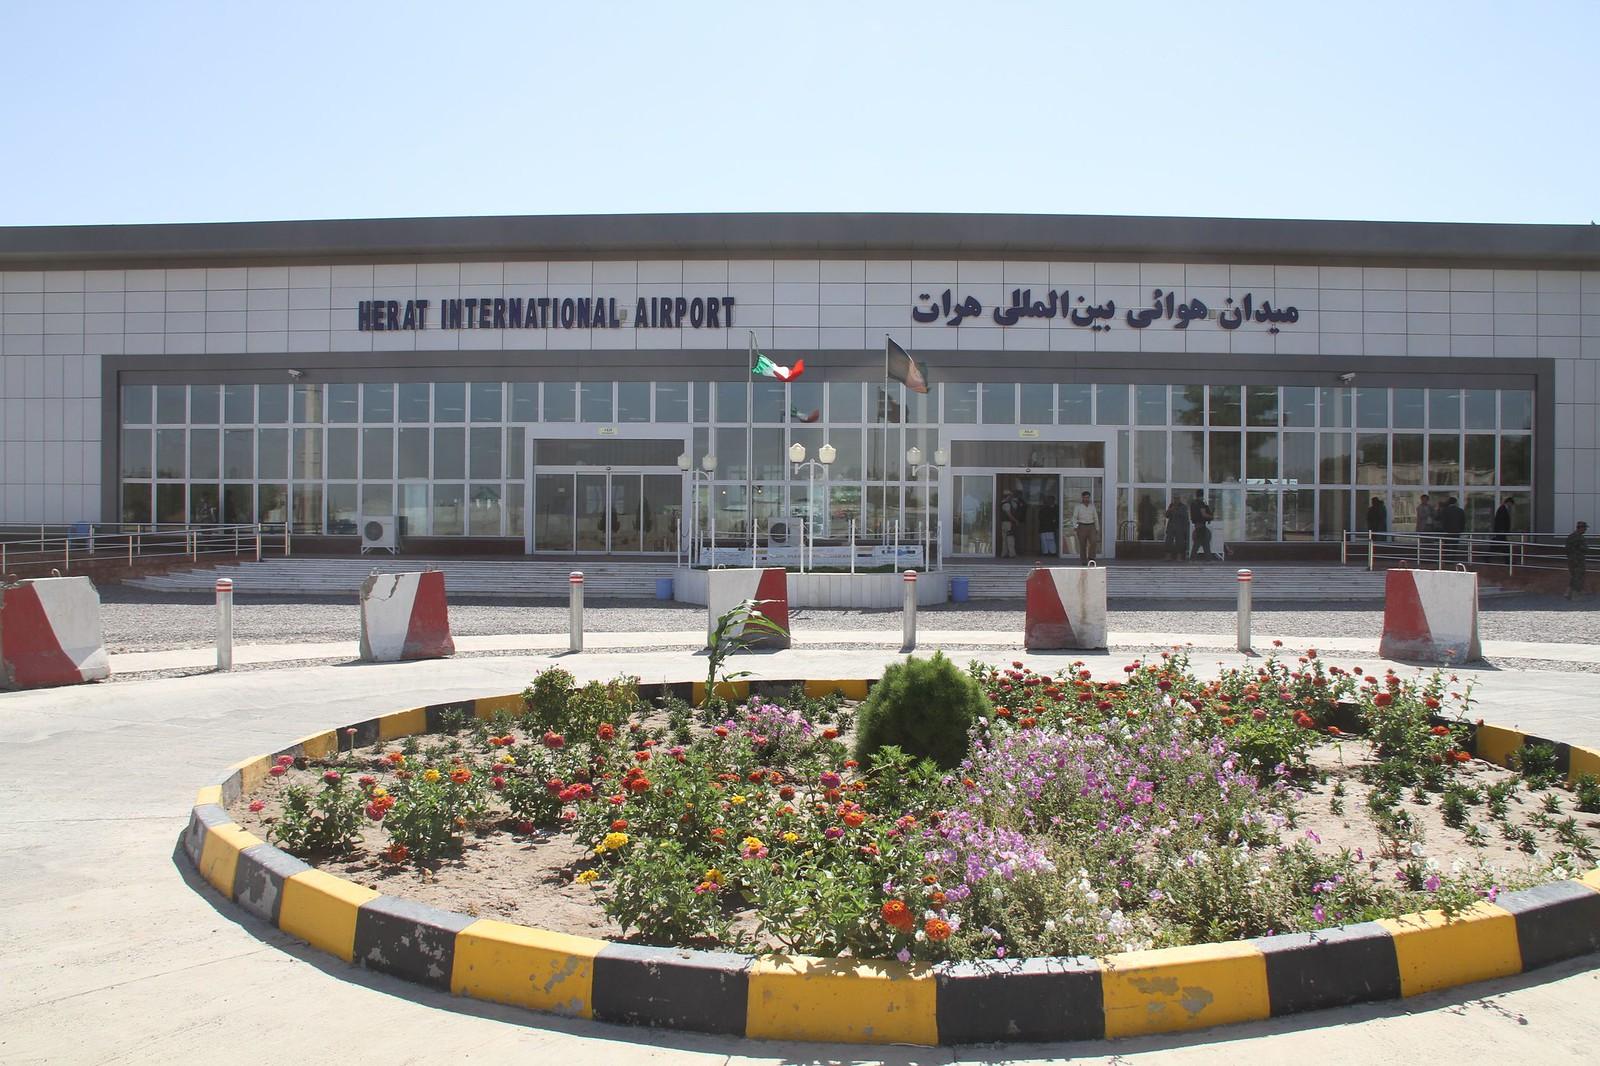 مطار هرات (هرات المطار) .1